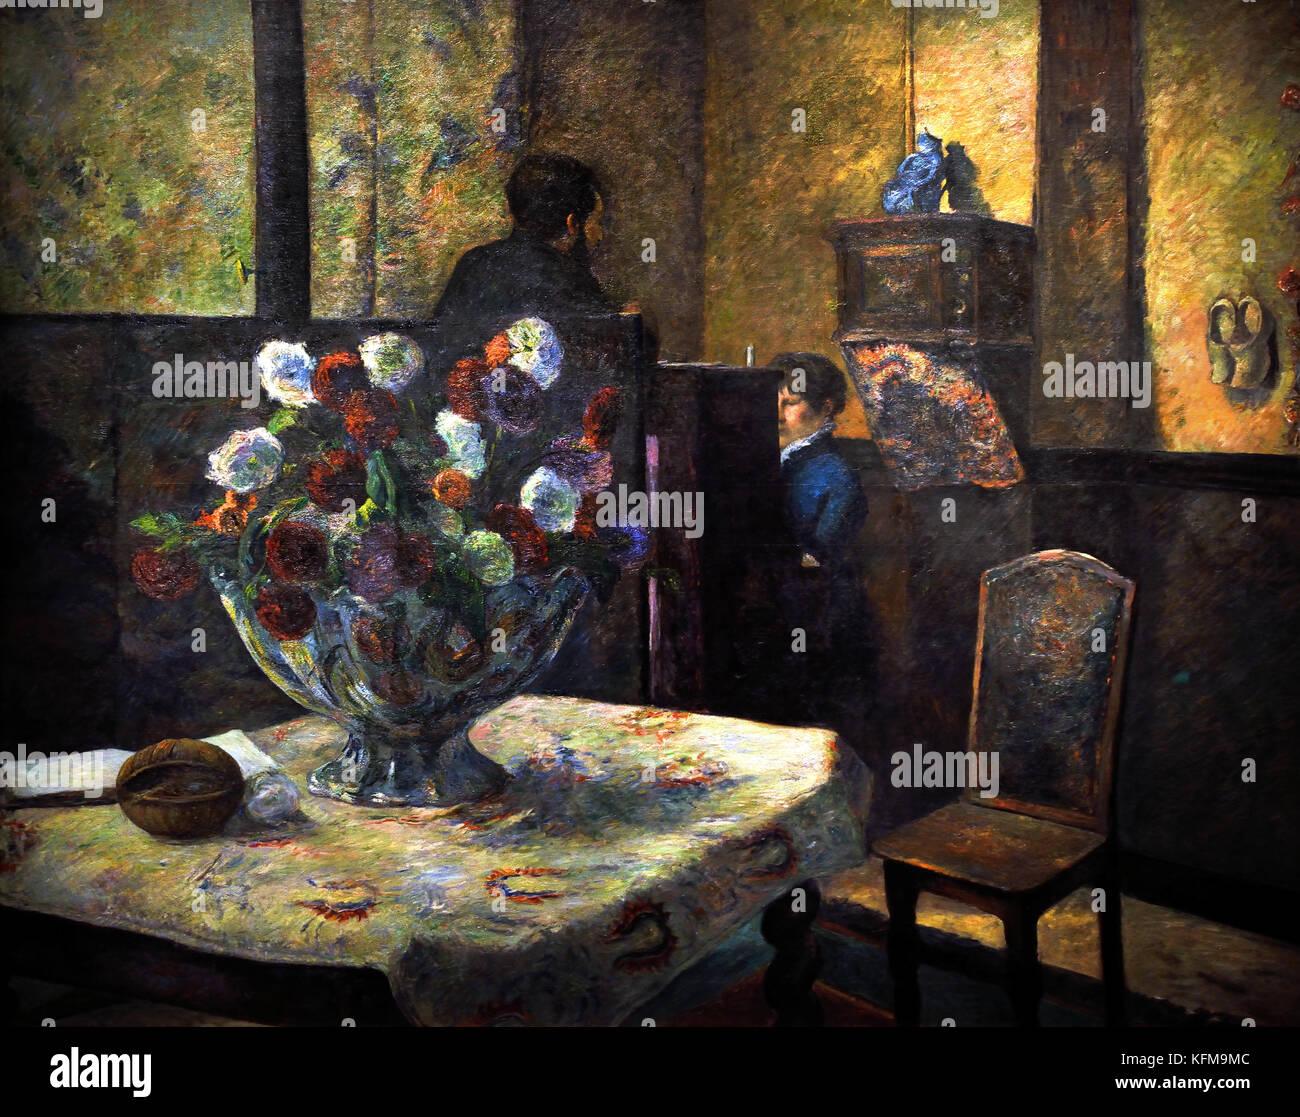 Fleurs, Nature Morte - Interieur du peintre Rue Carcel - Blumen, Stillleben - Interieur des Malers, Carcel Straße Stockbild